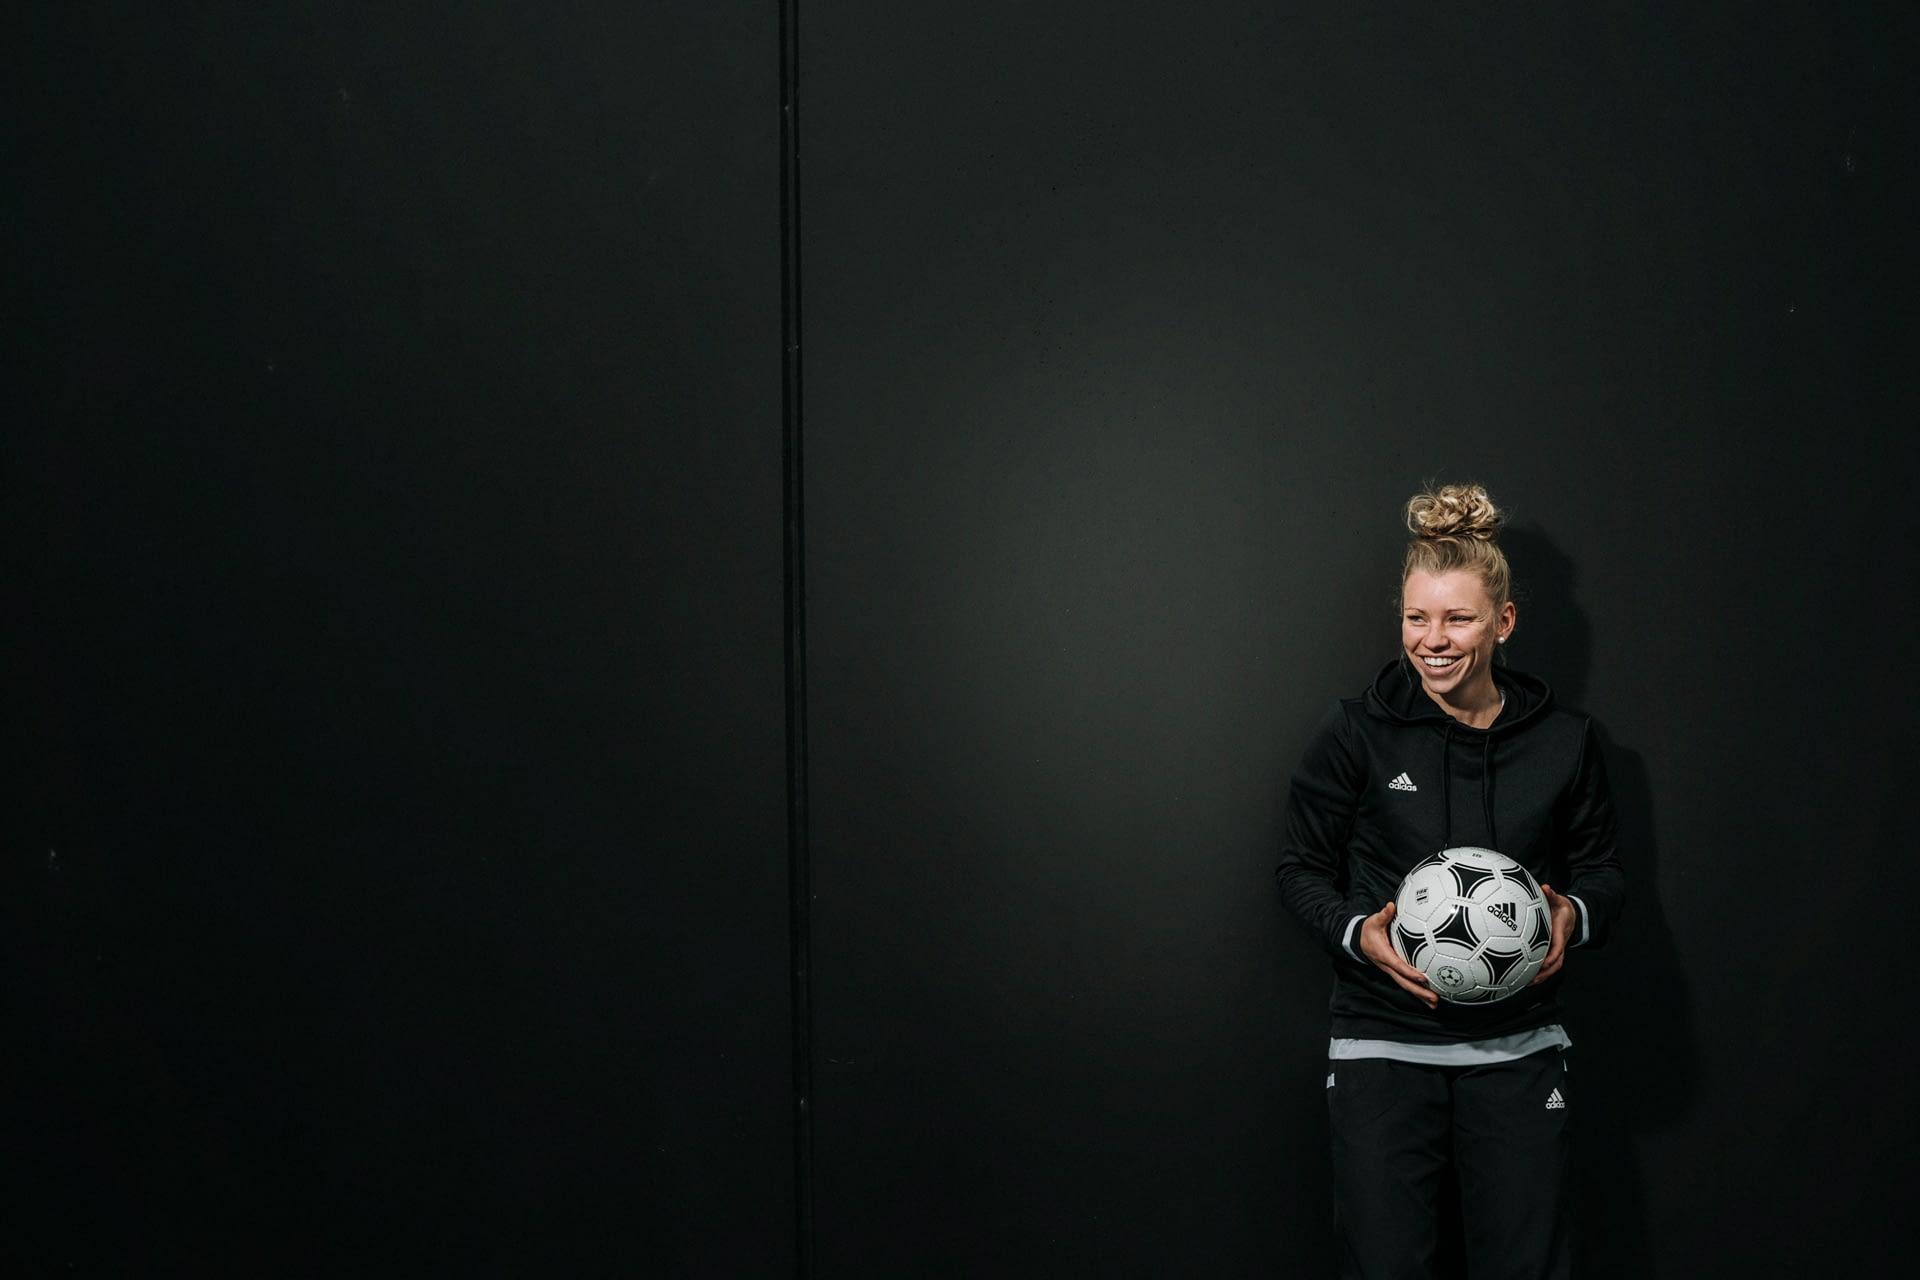 Linda-Dallmann-DFB-FCB-Portrait-Fotograf-München-05